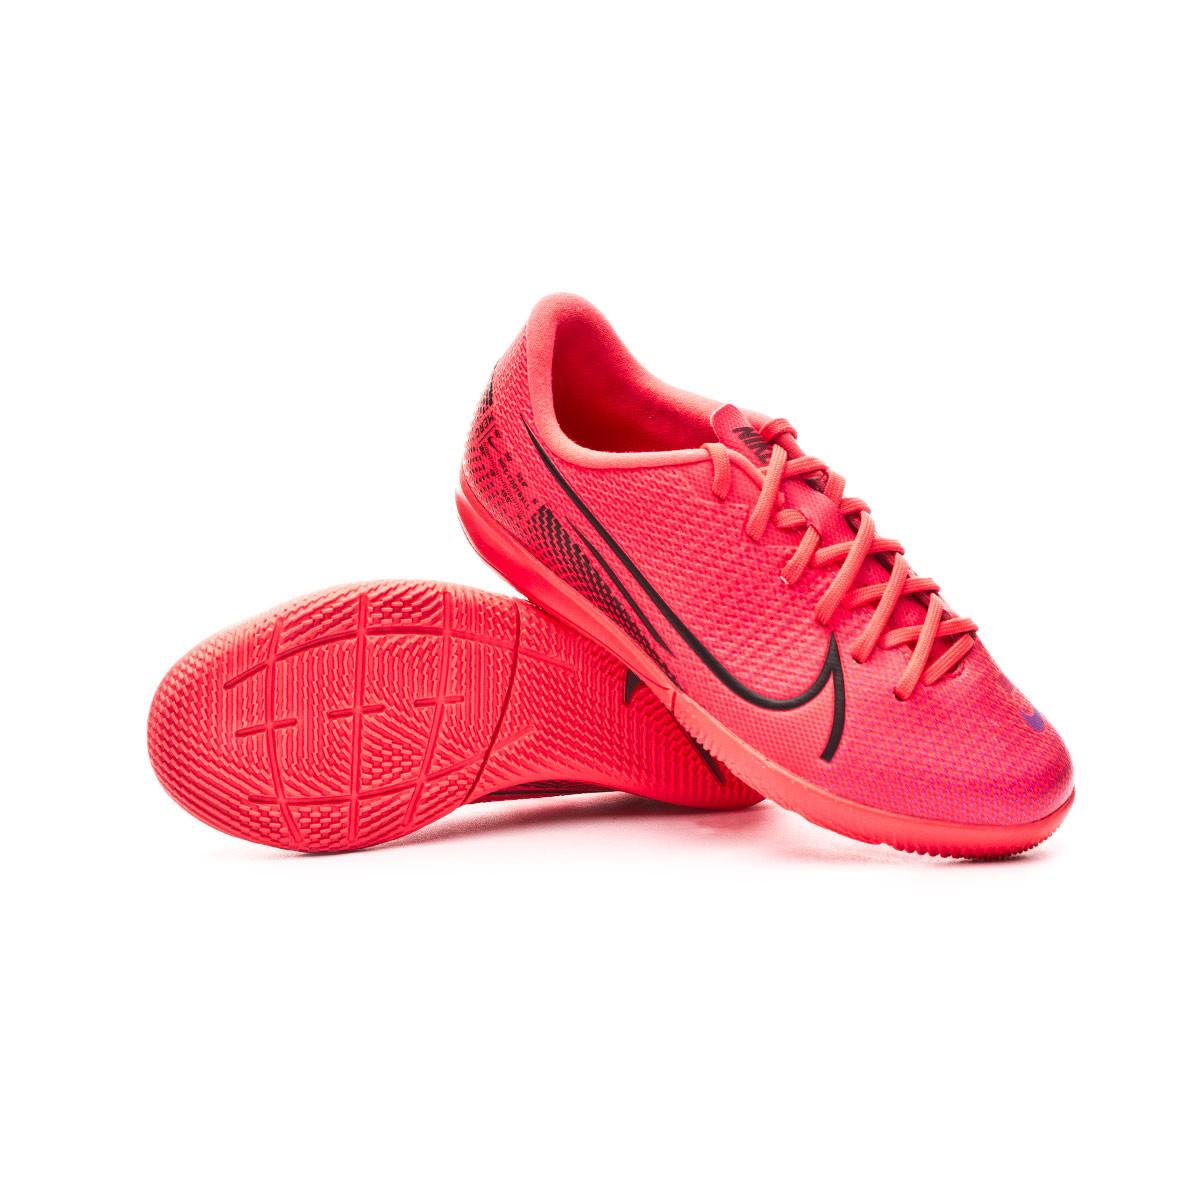 Sapatilha de Futsal Nike Mercurial Vapor XIII Academy IC Criança